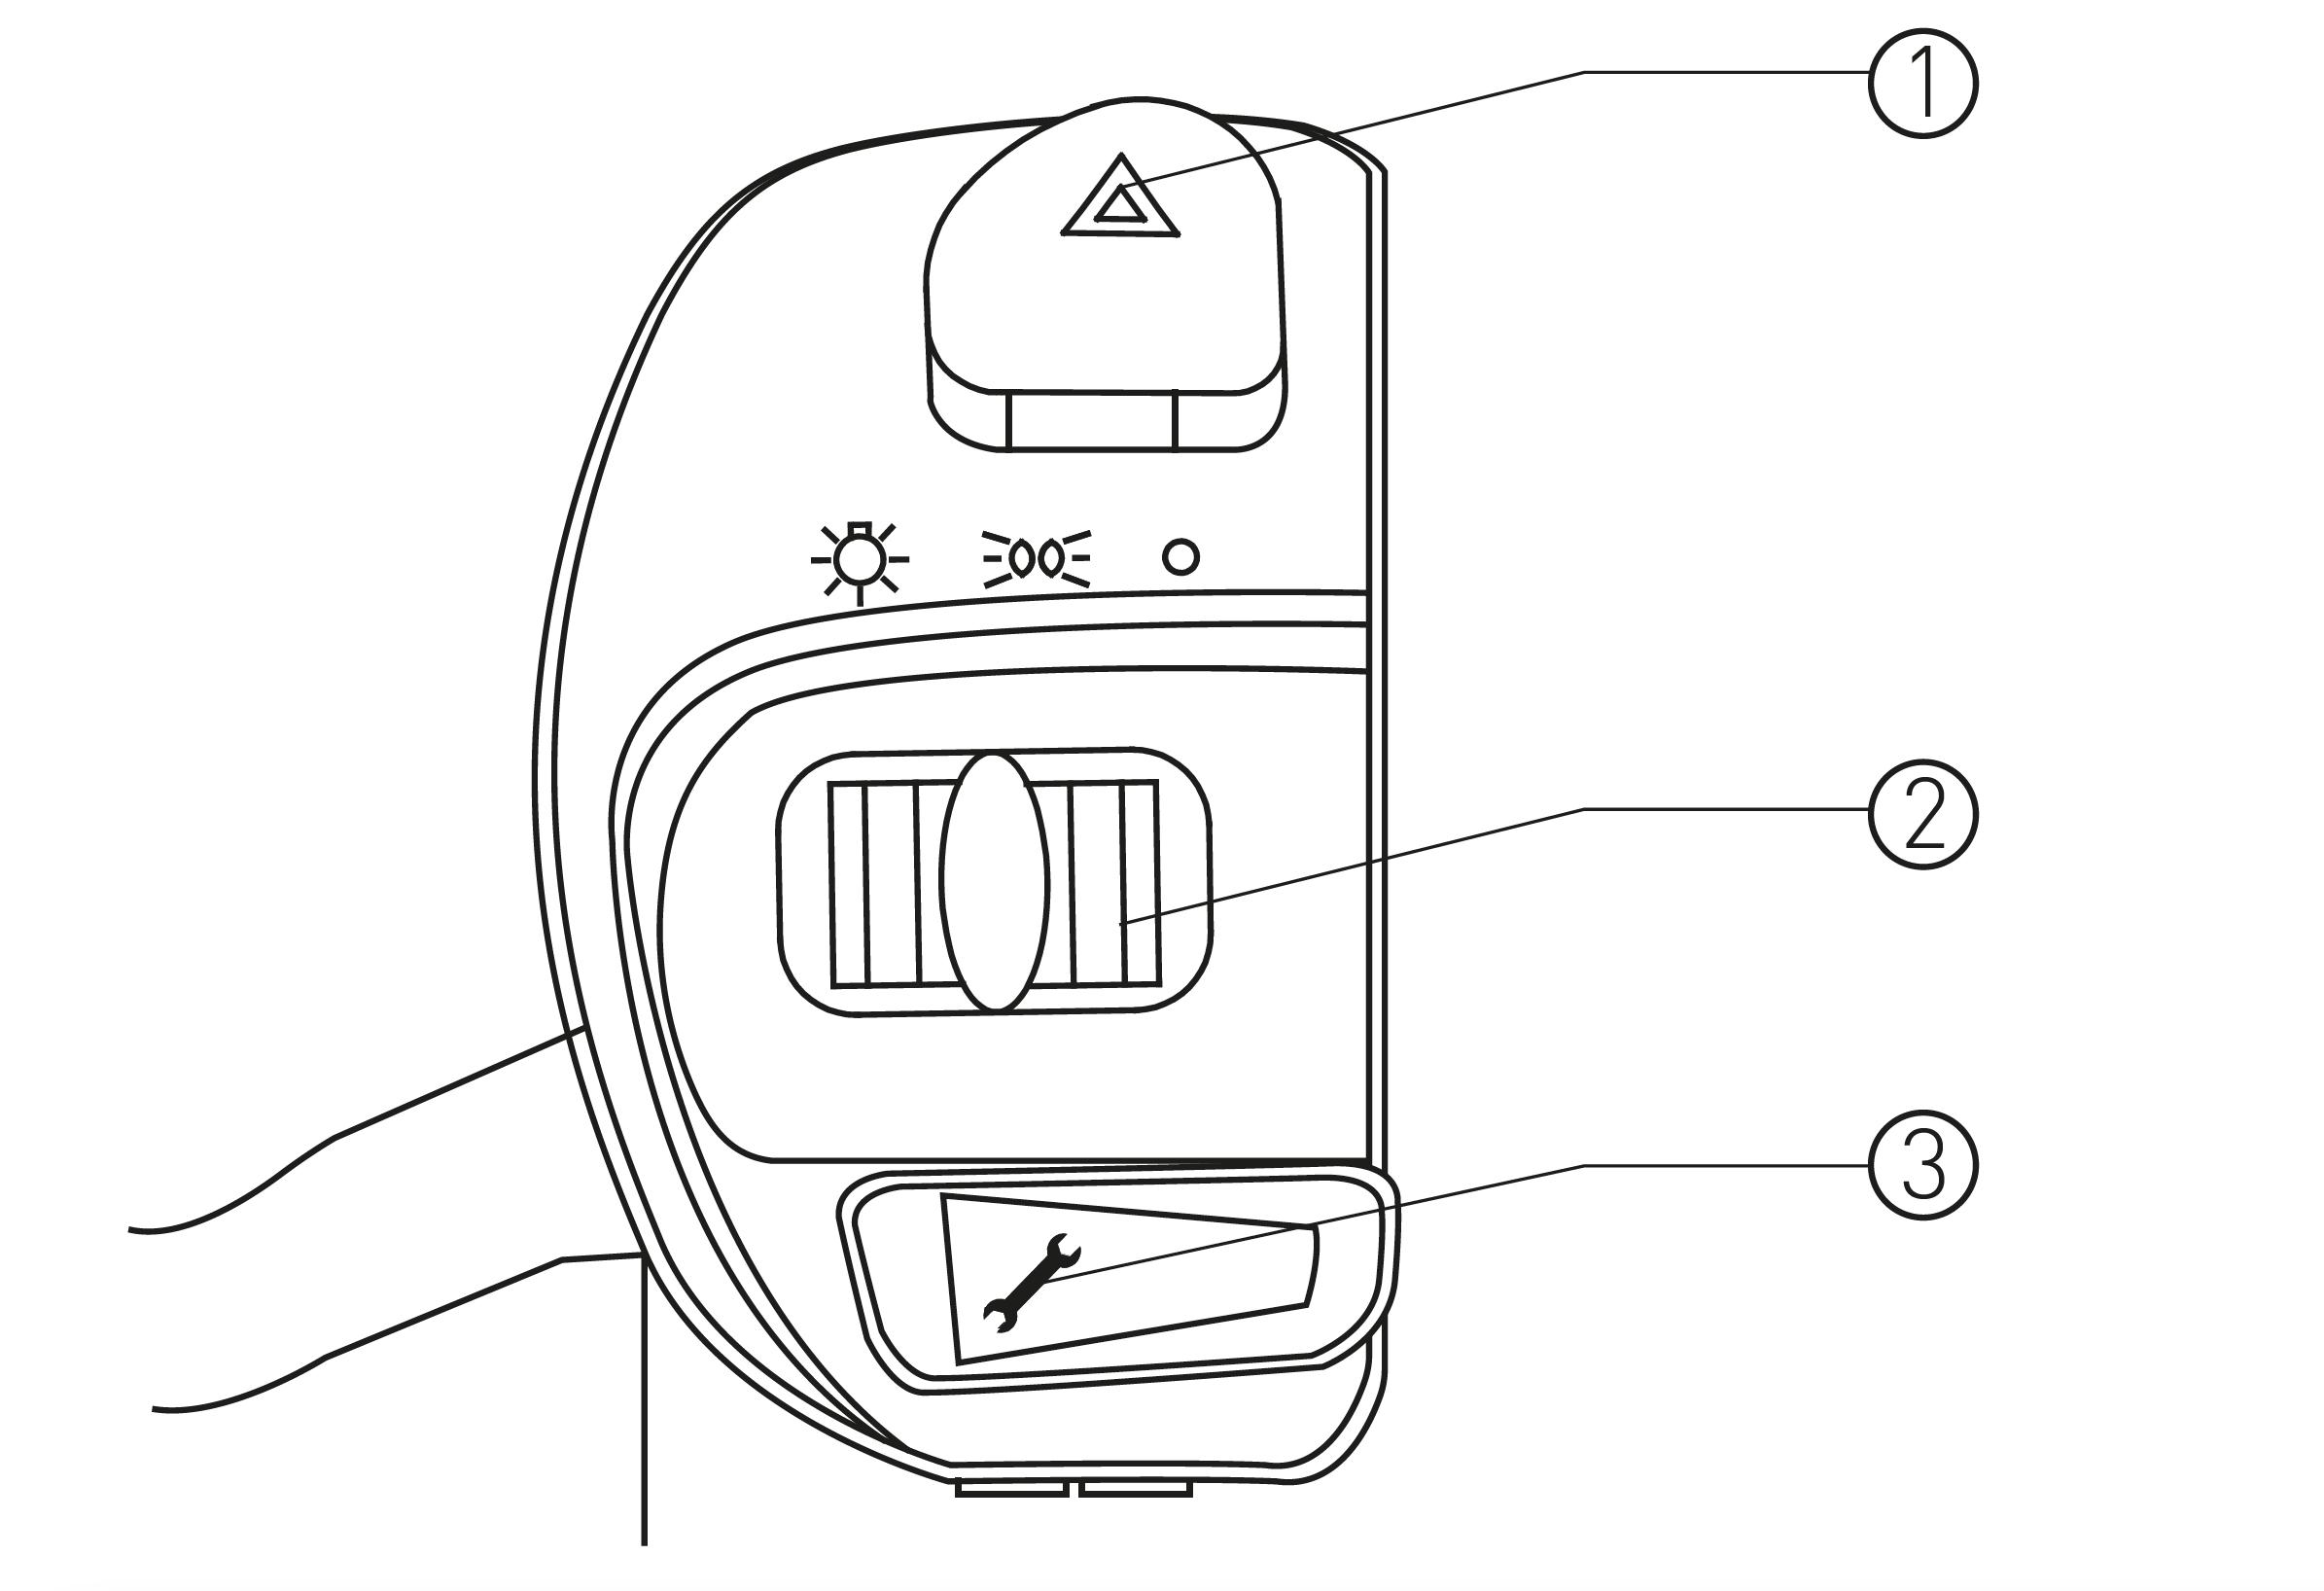 Rechte Armaturen des S6 max Elektro-Motorrollers von Nova Motors